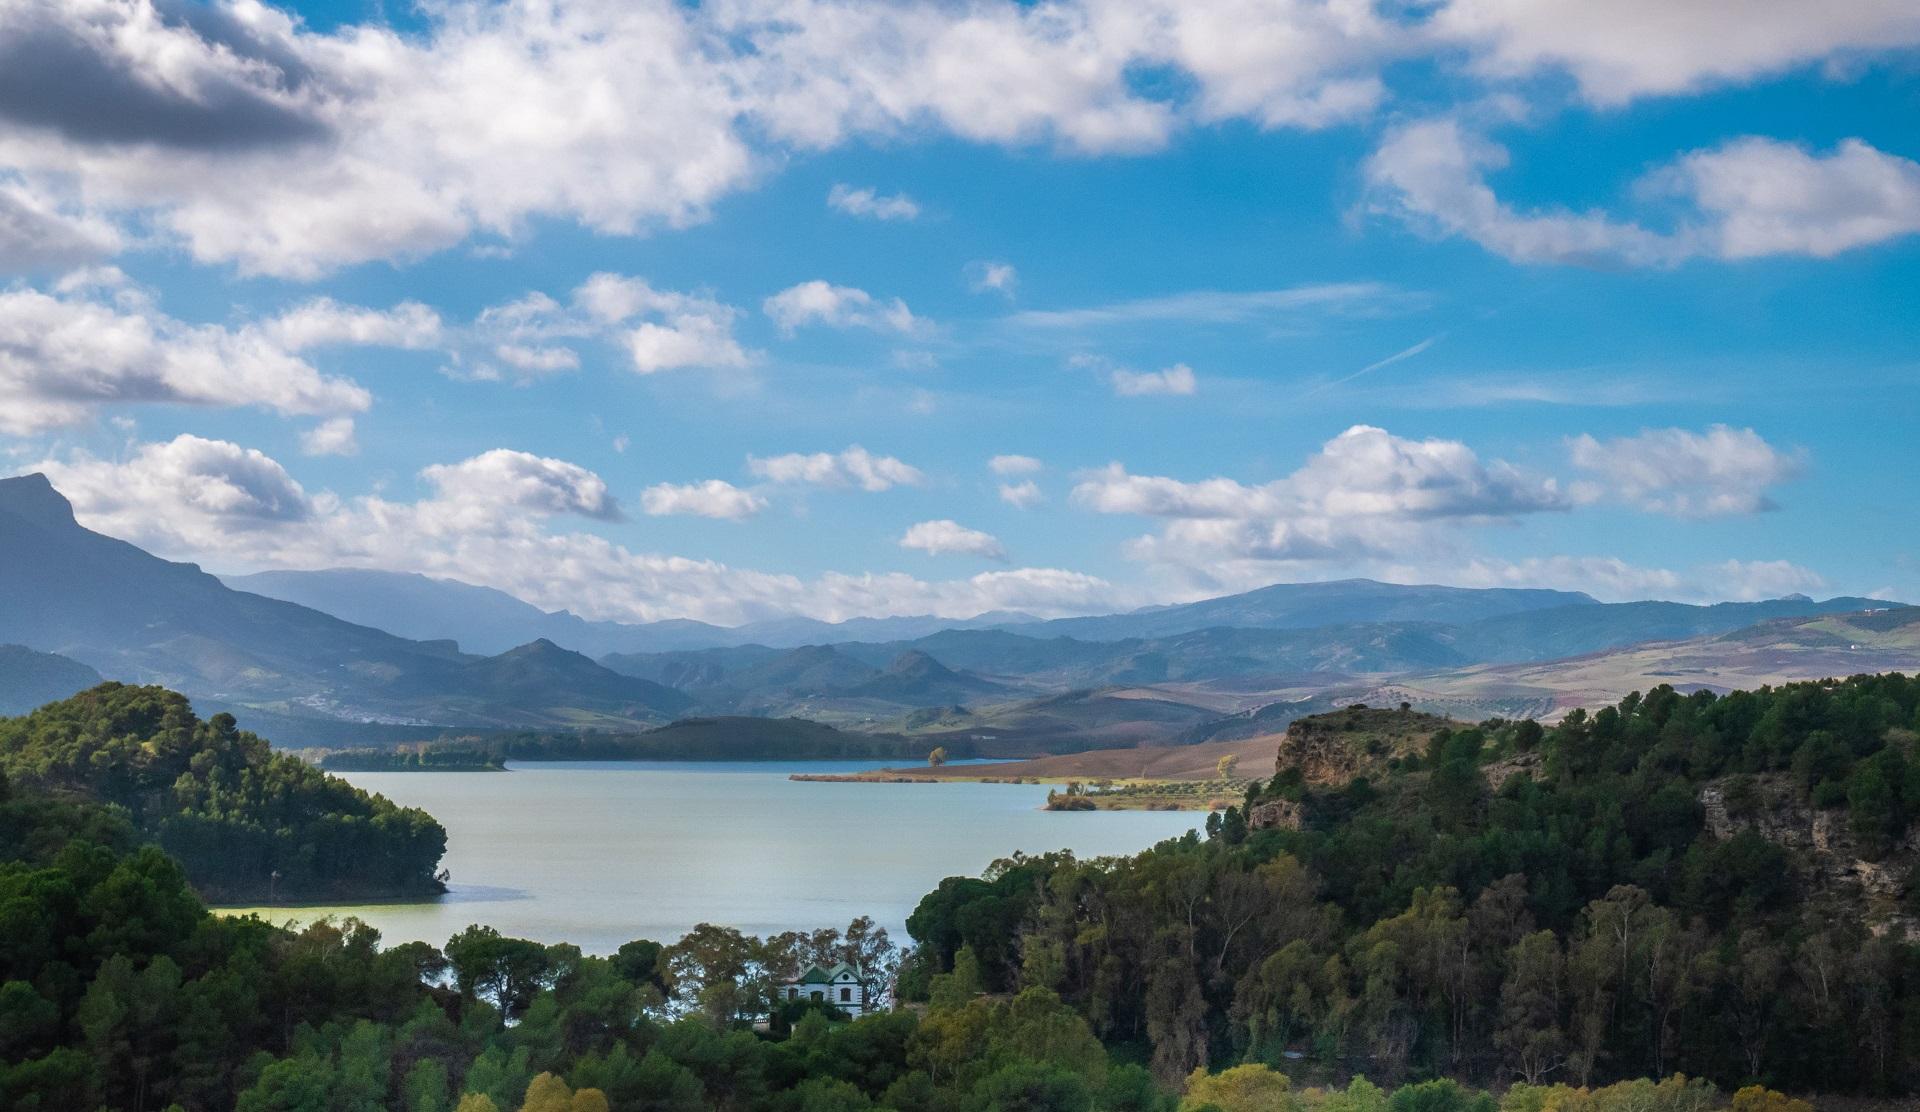 bridge-dam-reservoir-conde-de-guadalhorce-andalusia-spain